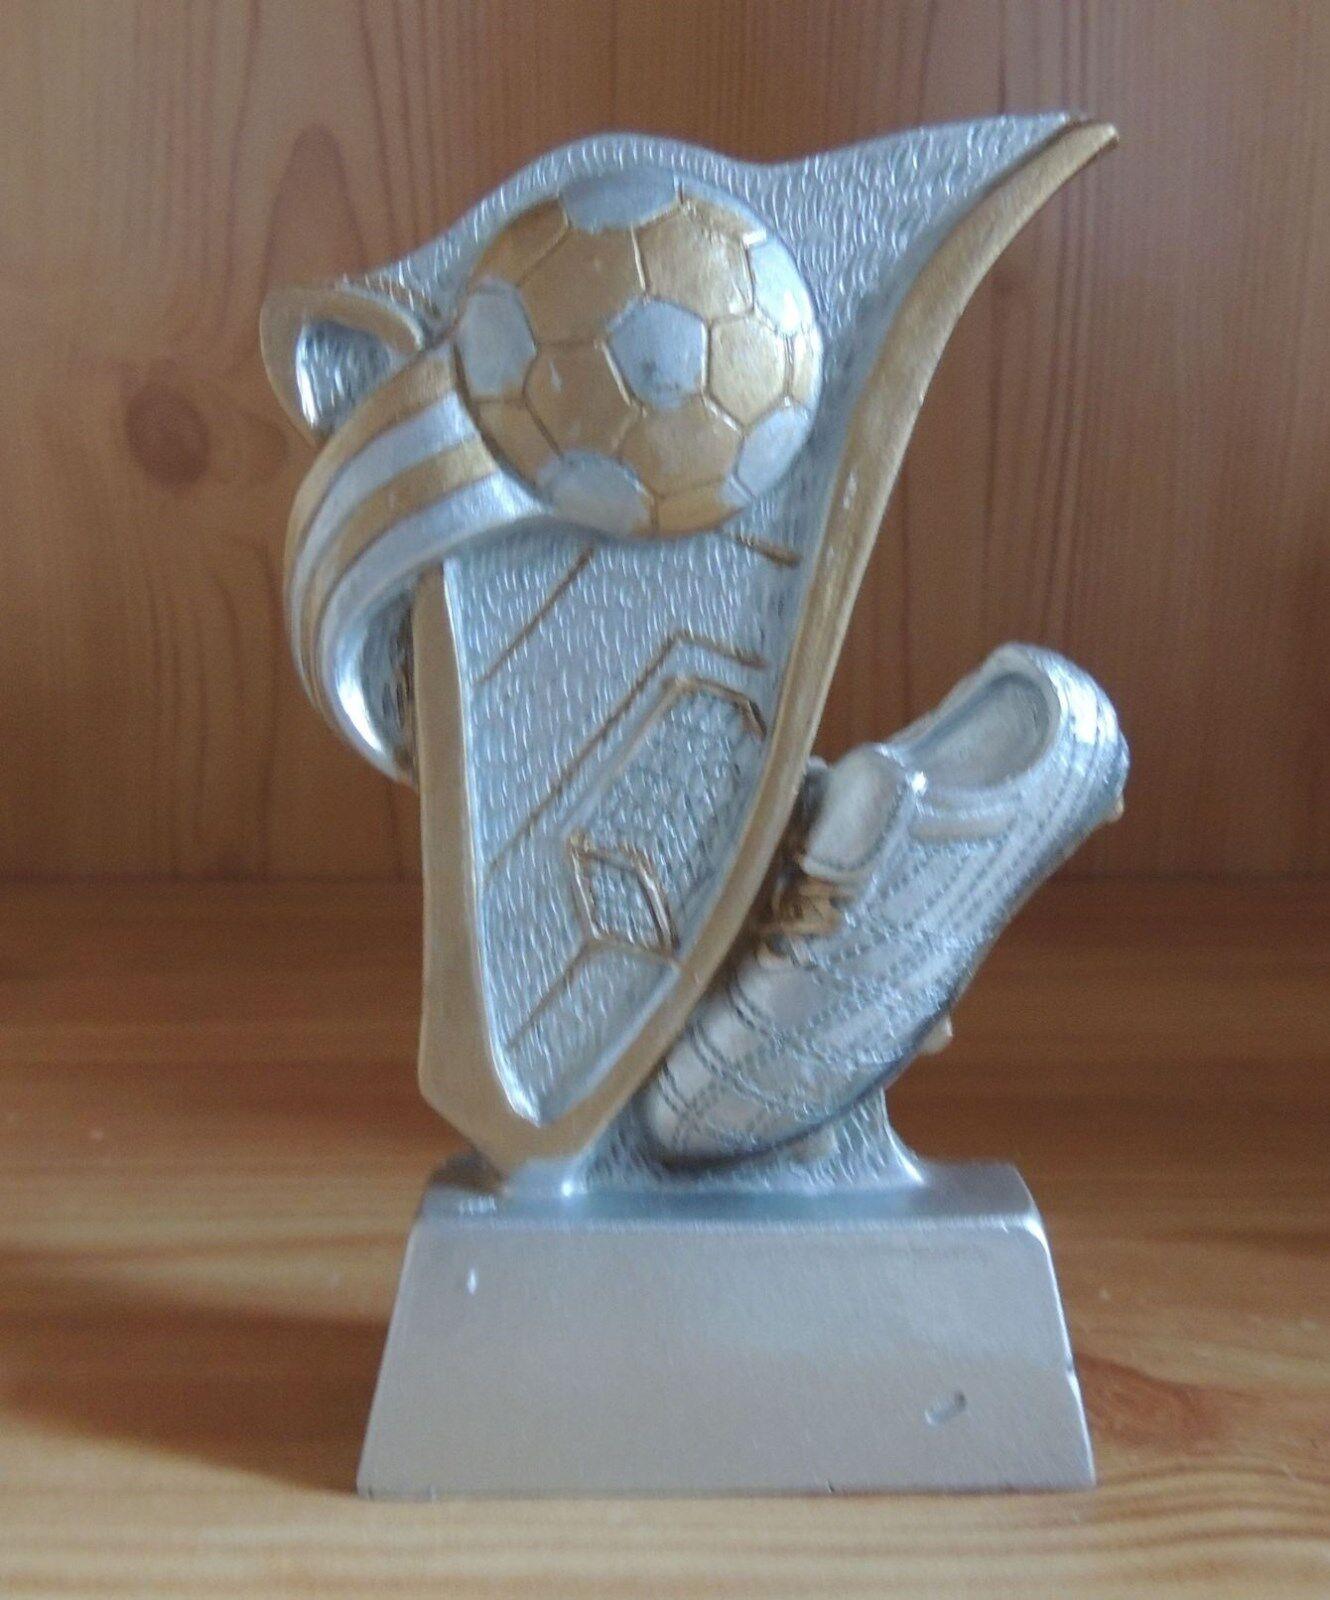 12 Figuren Figuren Figuren Fußball Fußball Schuh + Ball 15cm  FB181(Pokal Pokale Gravur Turnier) c77865